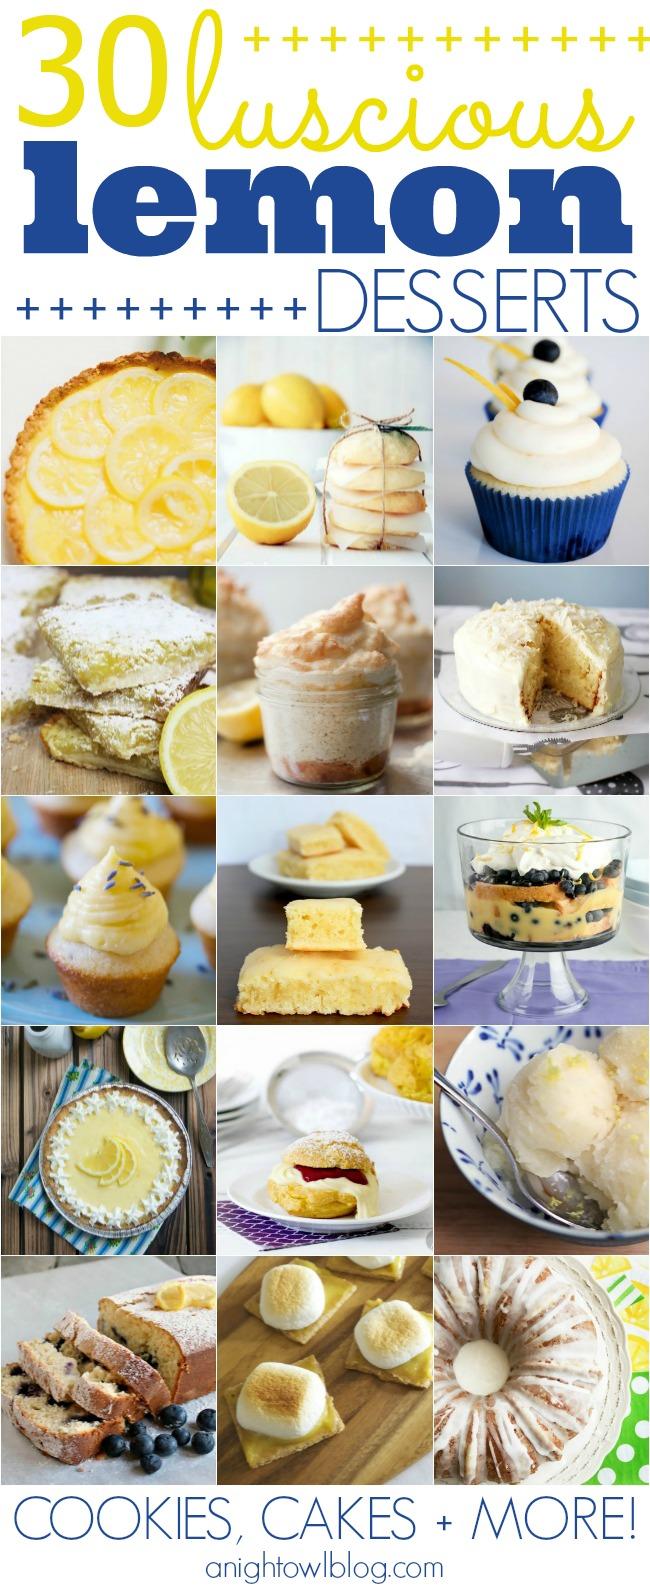 30 Luscious Lemon Desserts - cookies, cakes and more! | #lemon #desserts #recipes